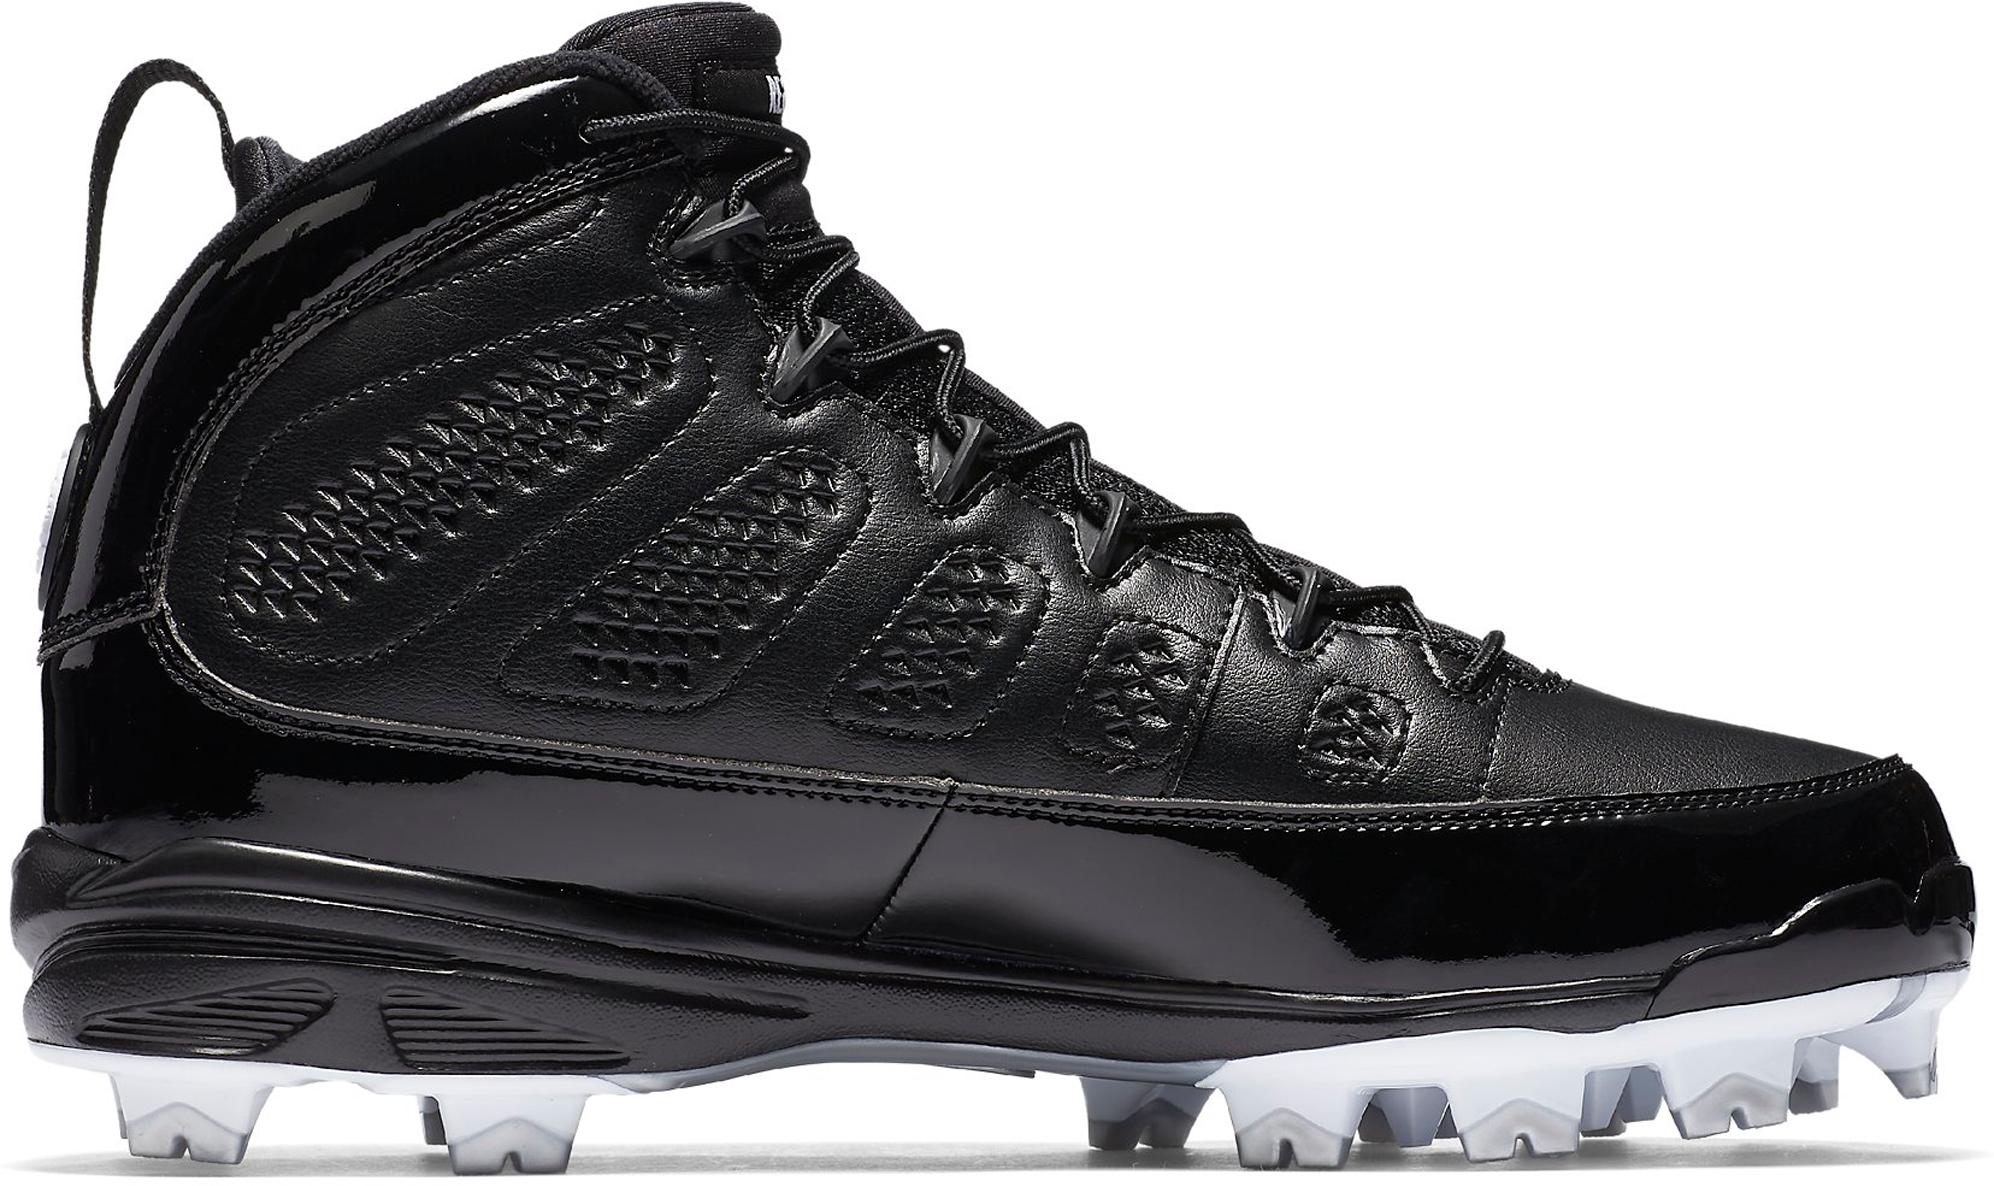 Jordan 9 Retro MCS Cleat RE2PECT Black